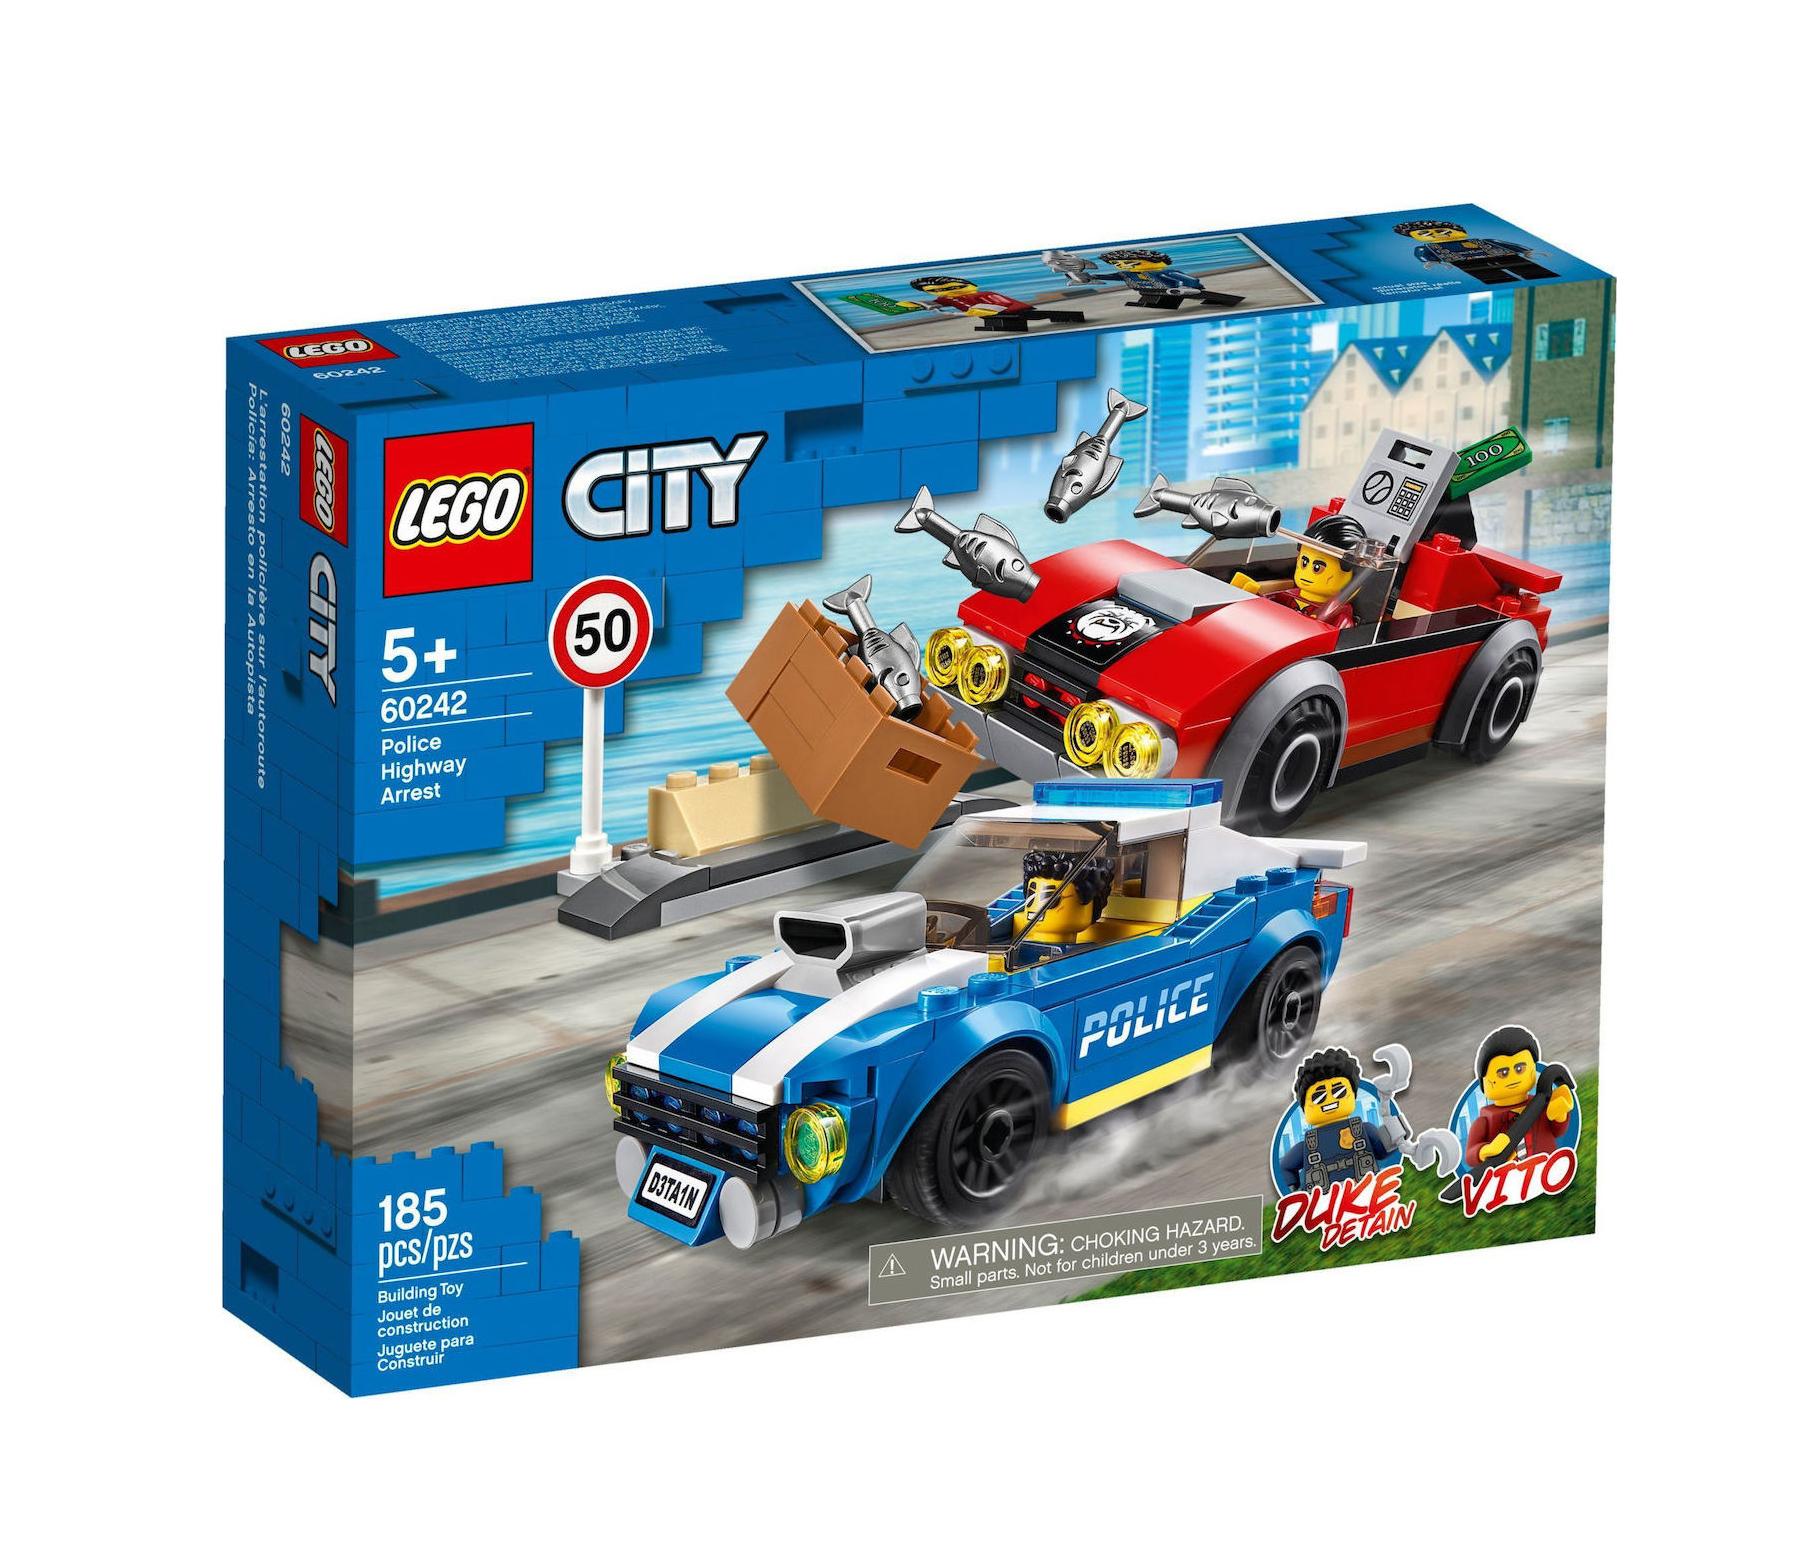 Lego City: Police Highway Arrest 60242